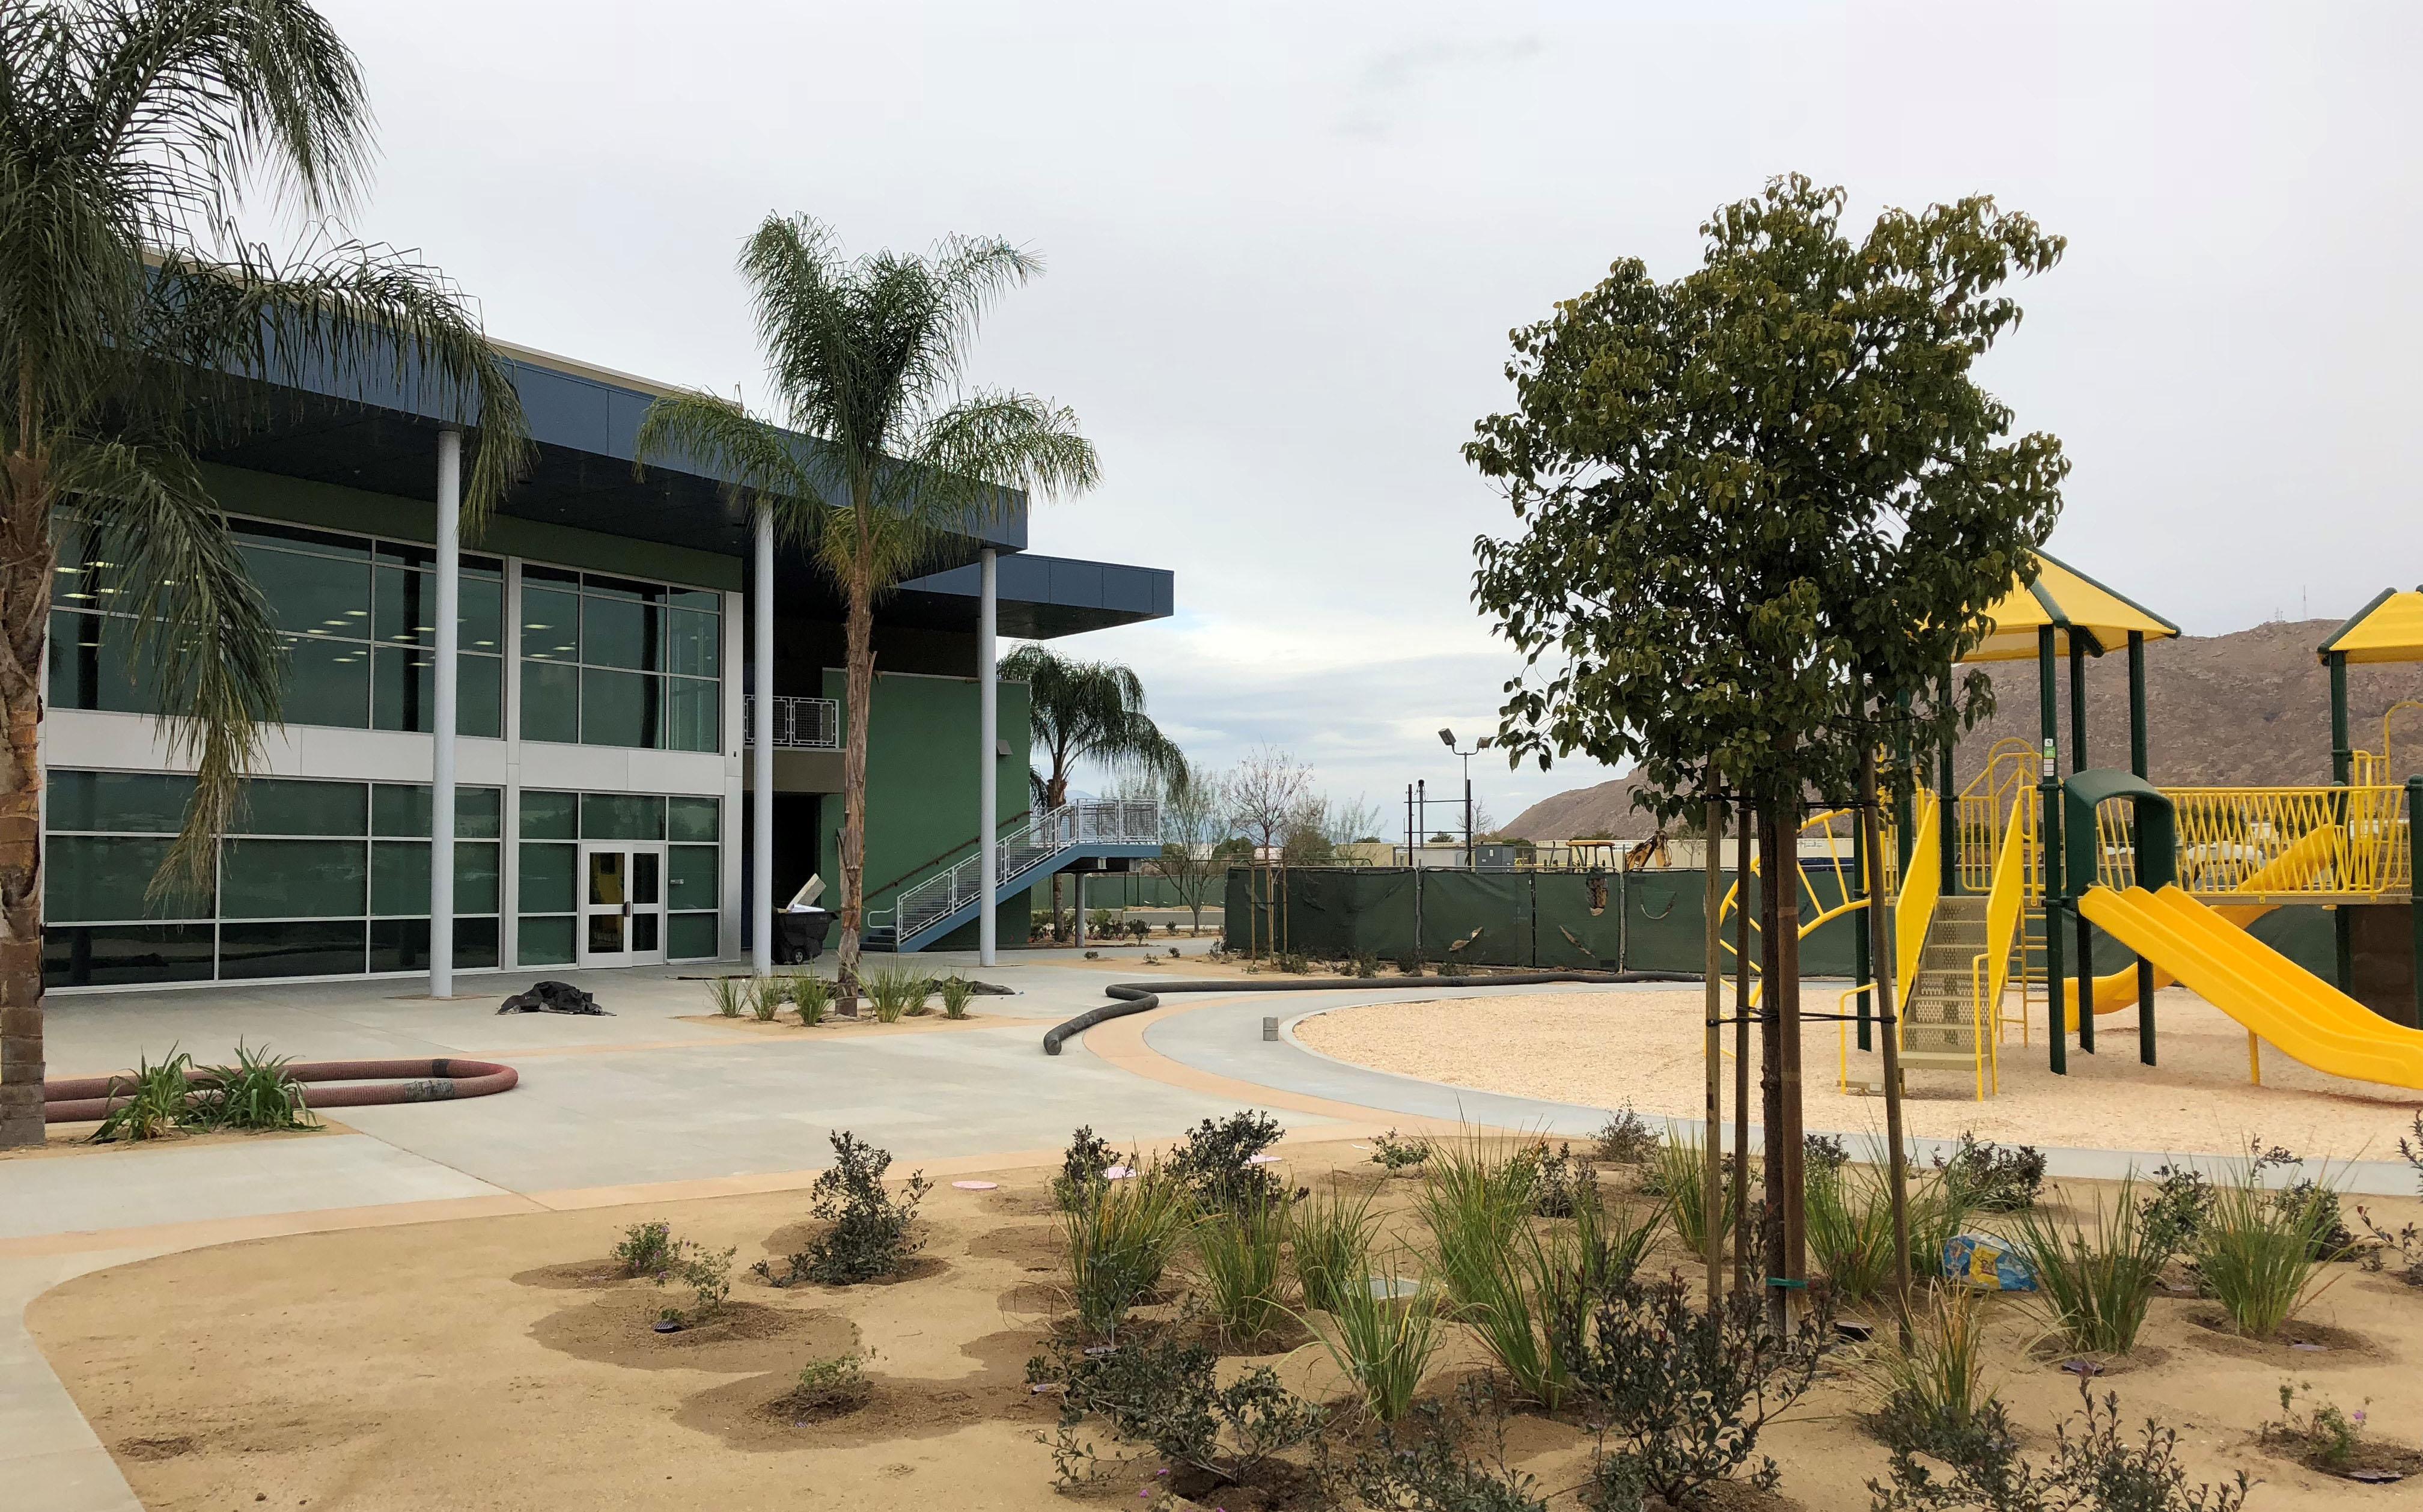 Edgemont Elementary